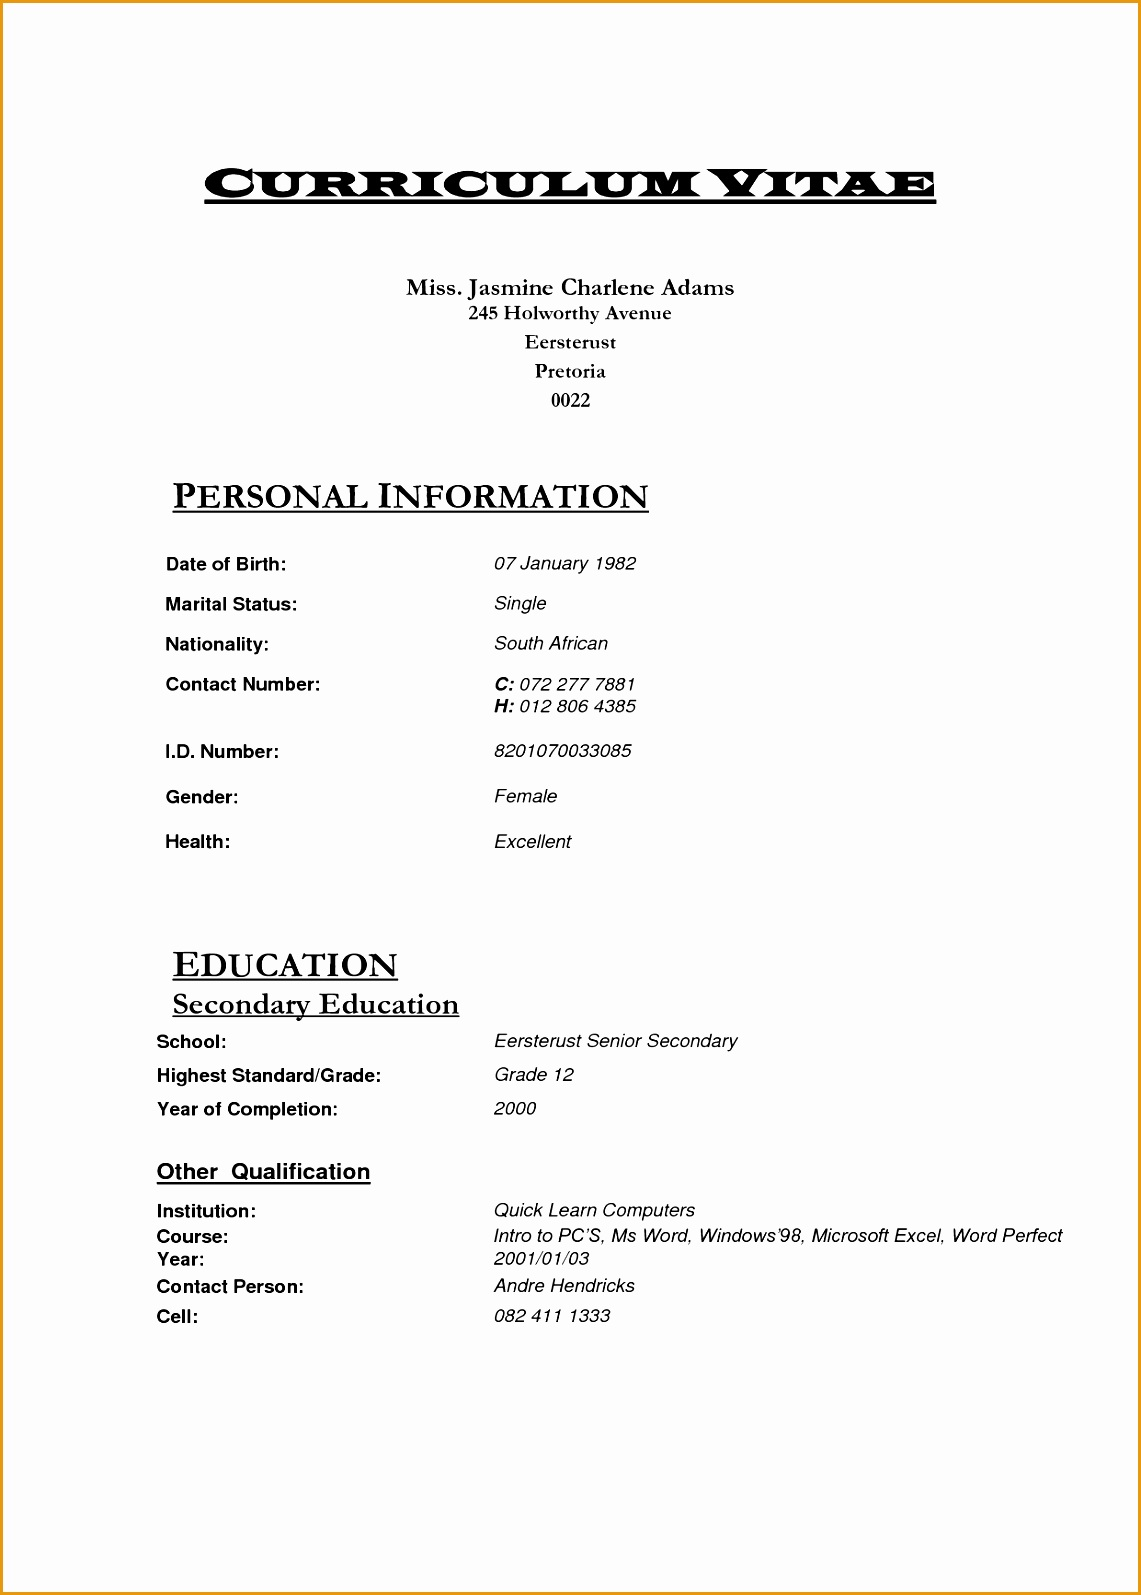 Download New Grad Resume Template Easy Nursing Examples Excellent Sample New Graduate Nurse15951141